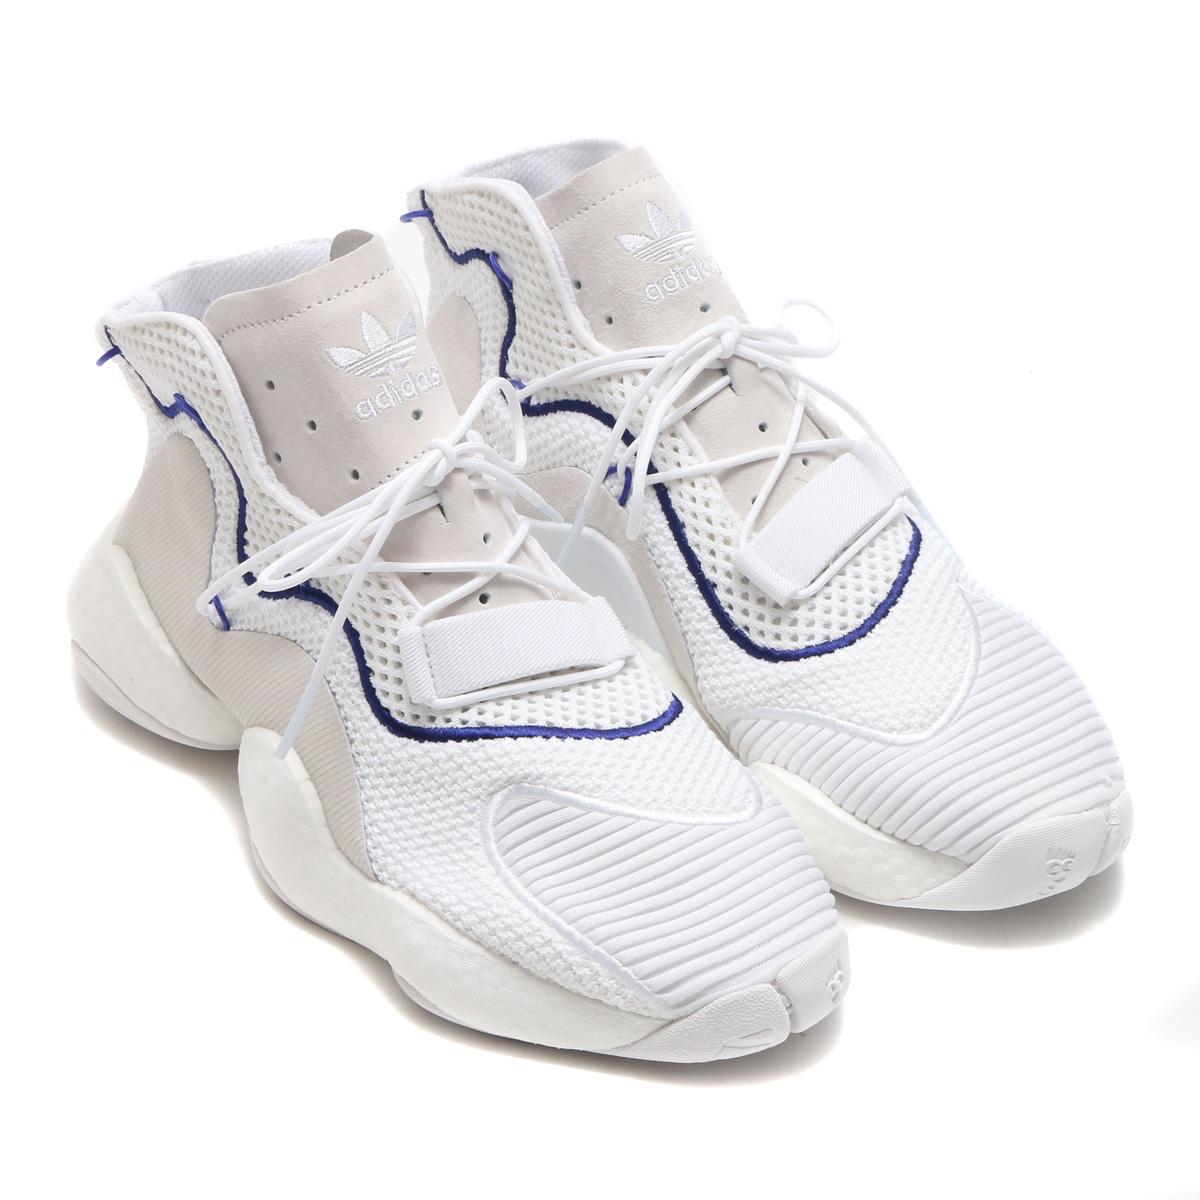 adidas Originals CRAZY BYW(アディダス オリジナルス クレイジー BYW)(ランニングホワイト/ランニングホワイト/リアルパープル S18)18SS-I